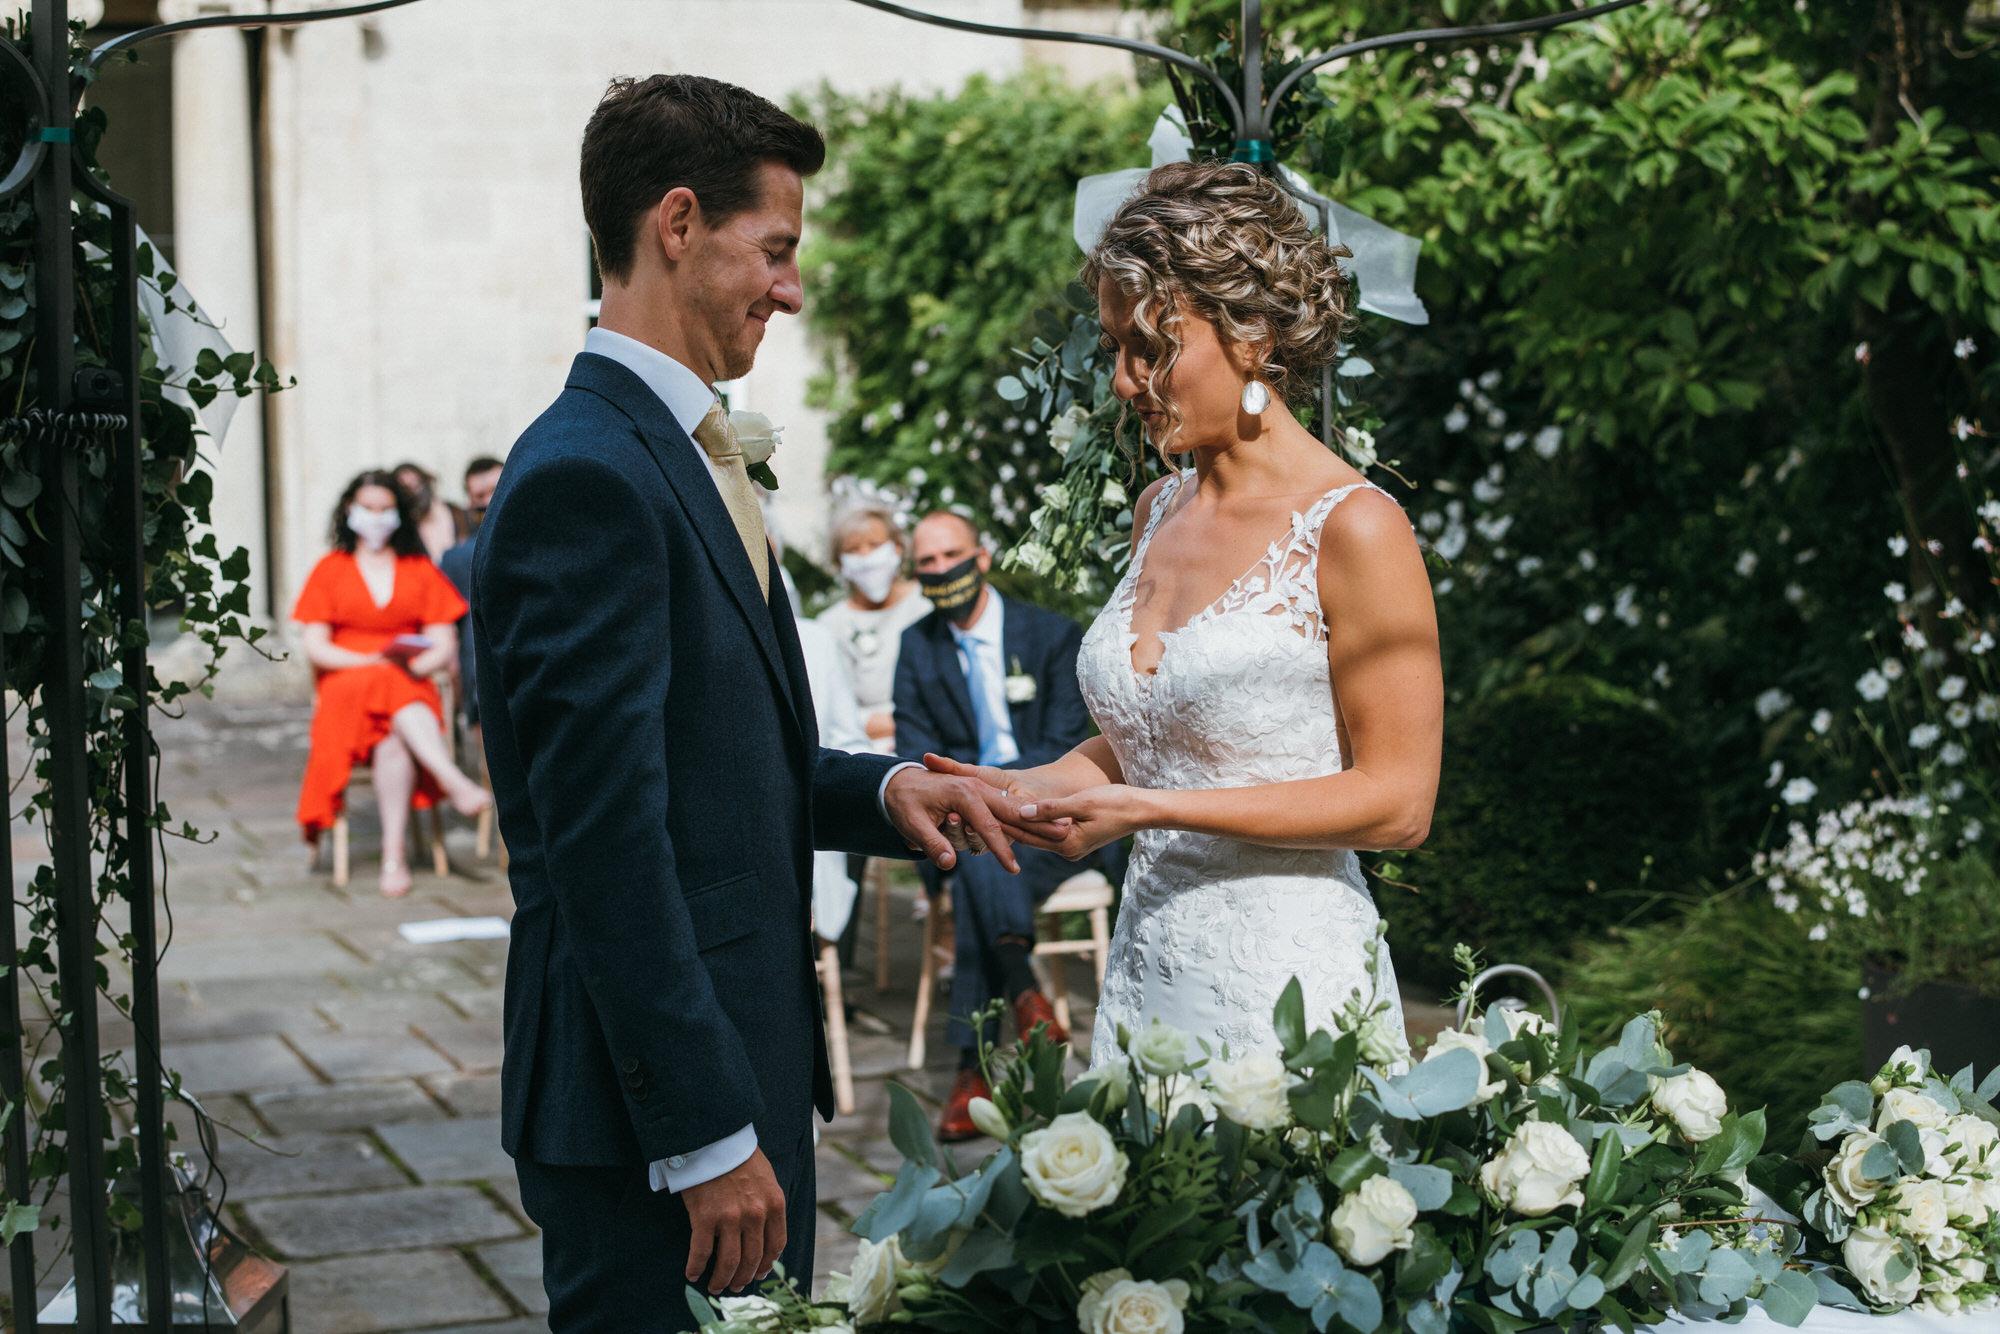 Royal crescent wedding ceremony